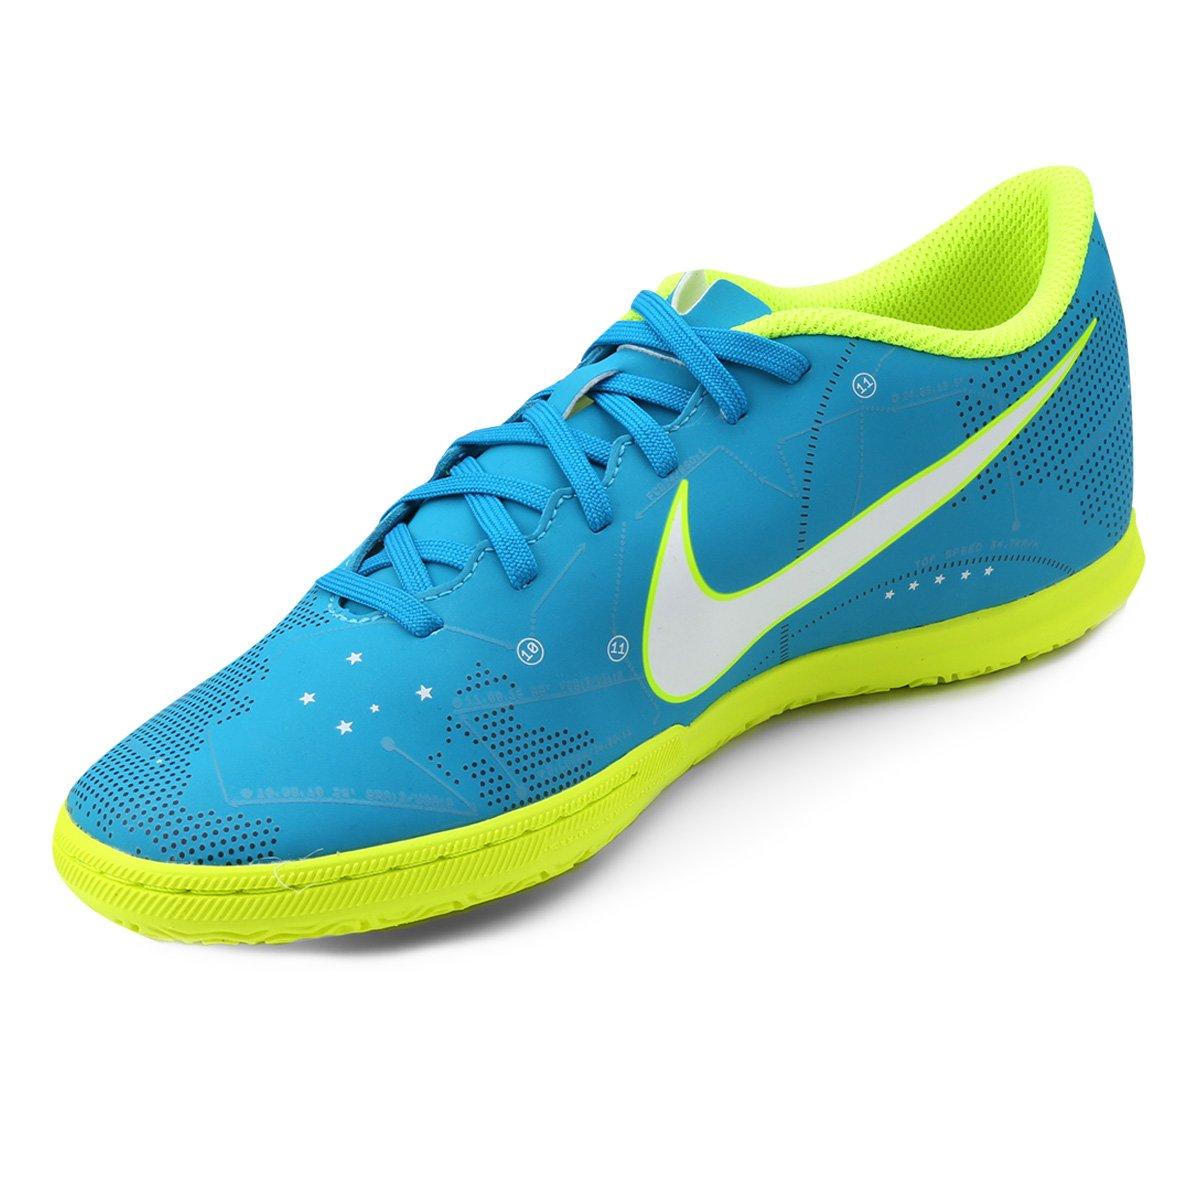 Chuteira Futsal Nike Mercurial Vortex 3 Neymar Jr IC - Azul e Branco ... 999ceee2caccb